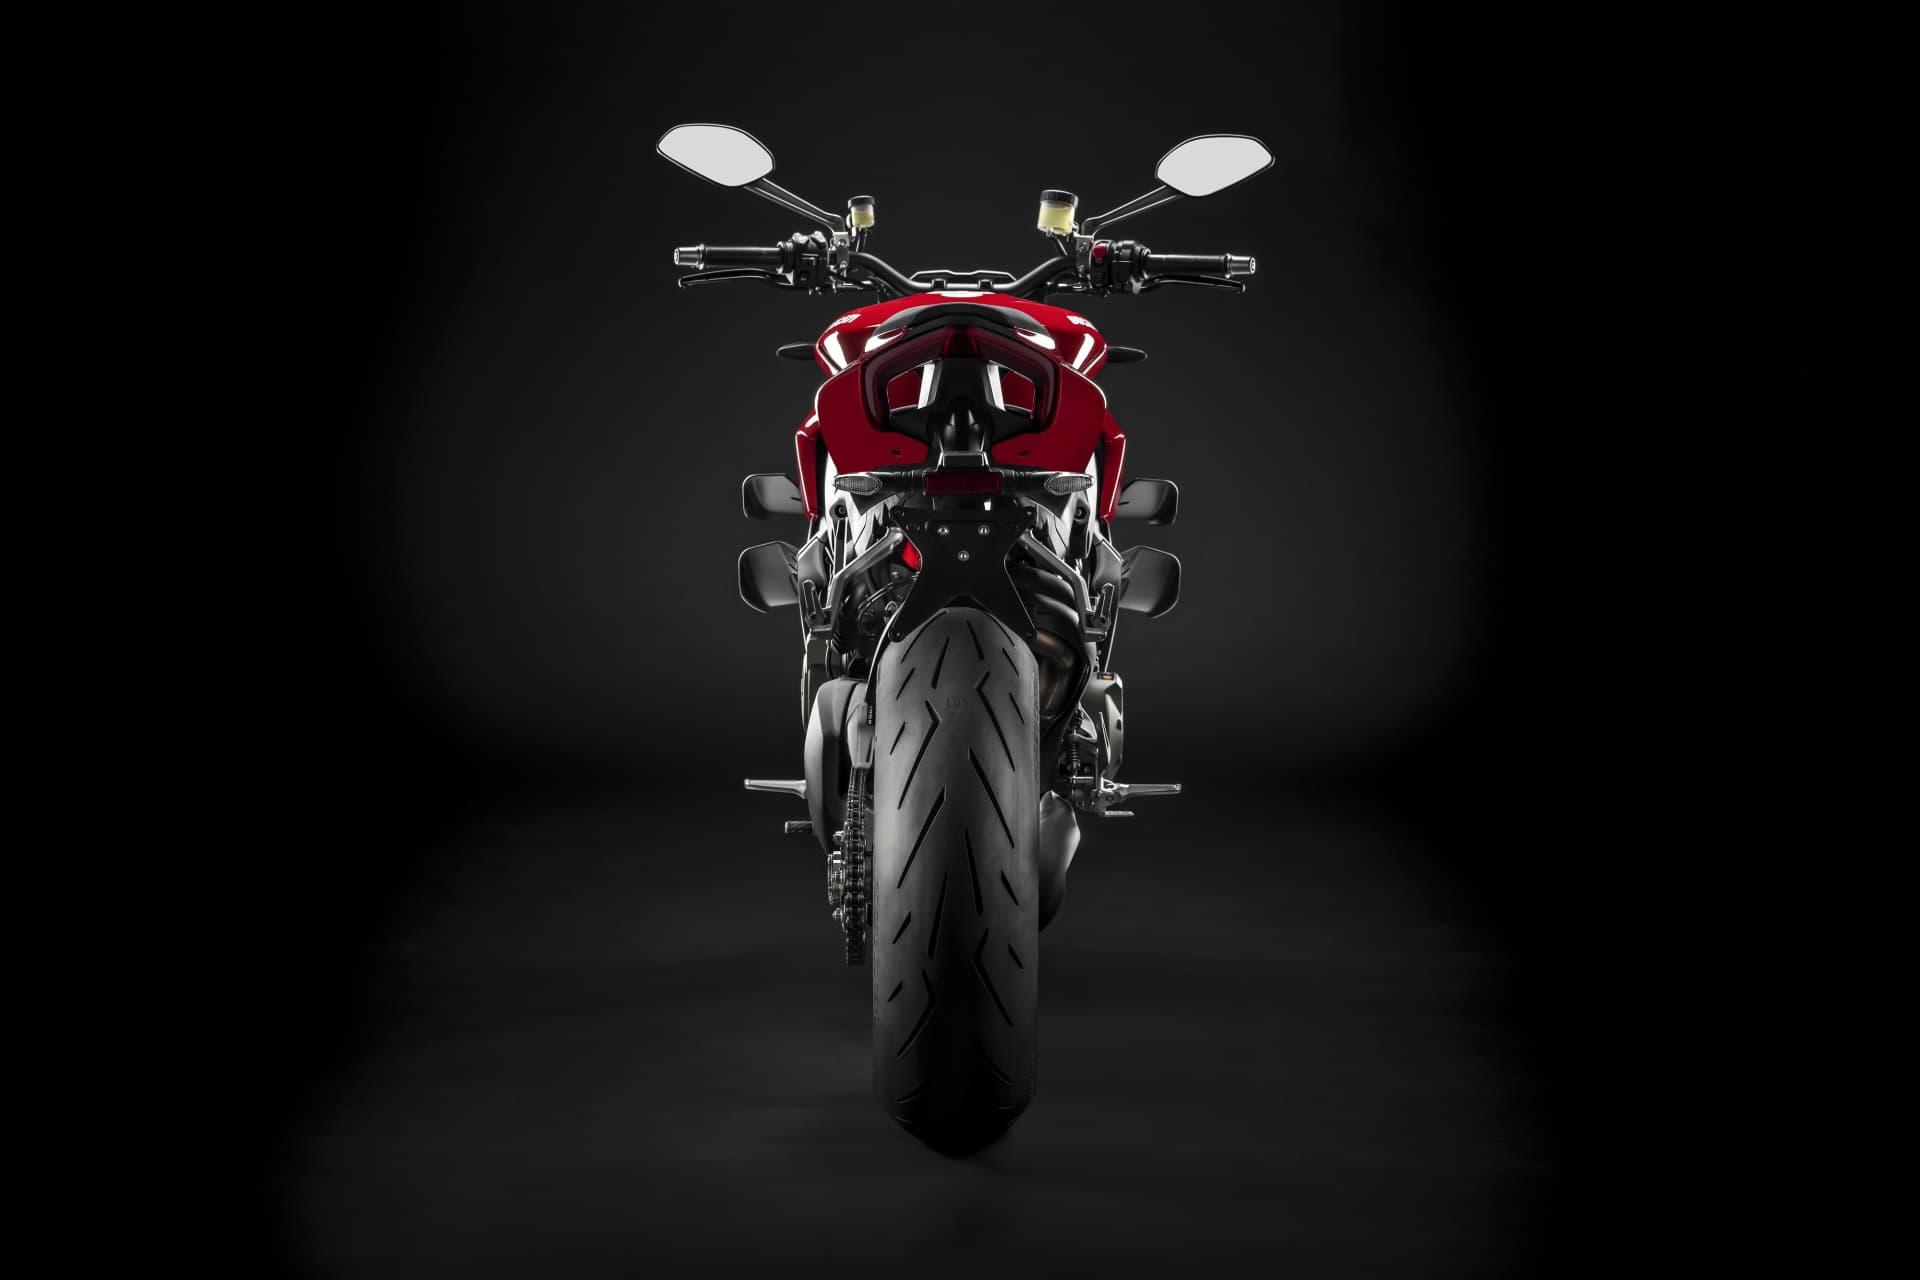 My20 Ducati Streetfigher V4 S 07 Uc101688 Mid